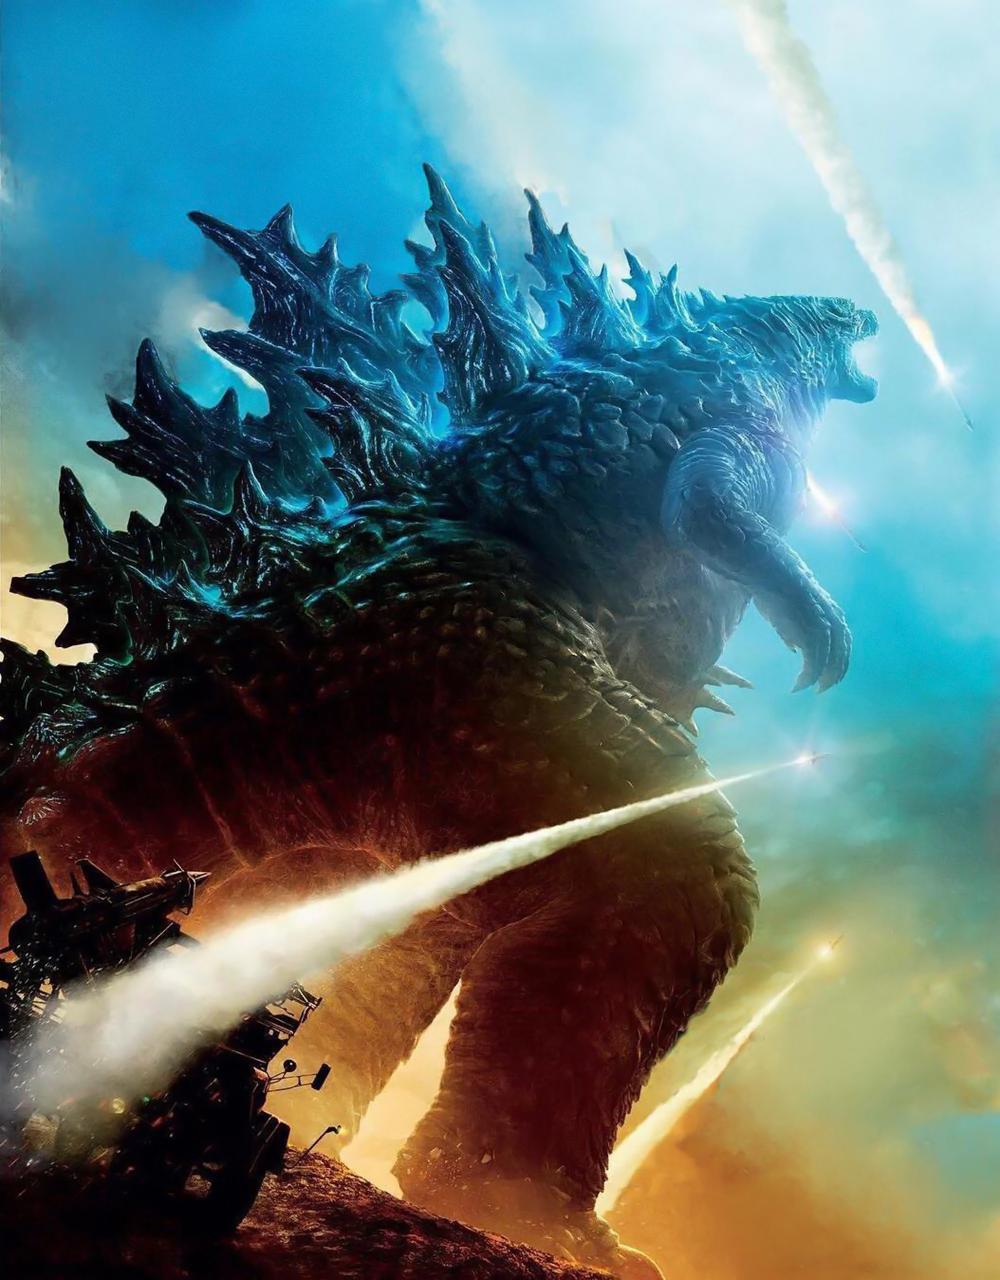 Wallpaper : Godzilla King of the Monsters, kaiju, creature ...